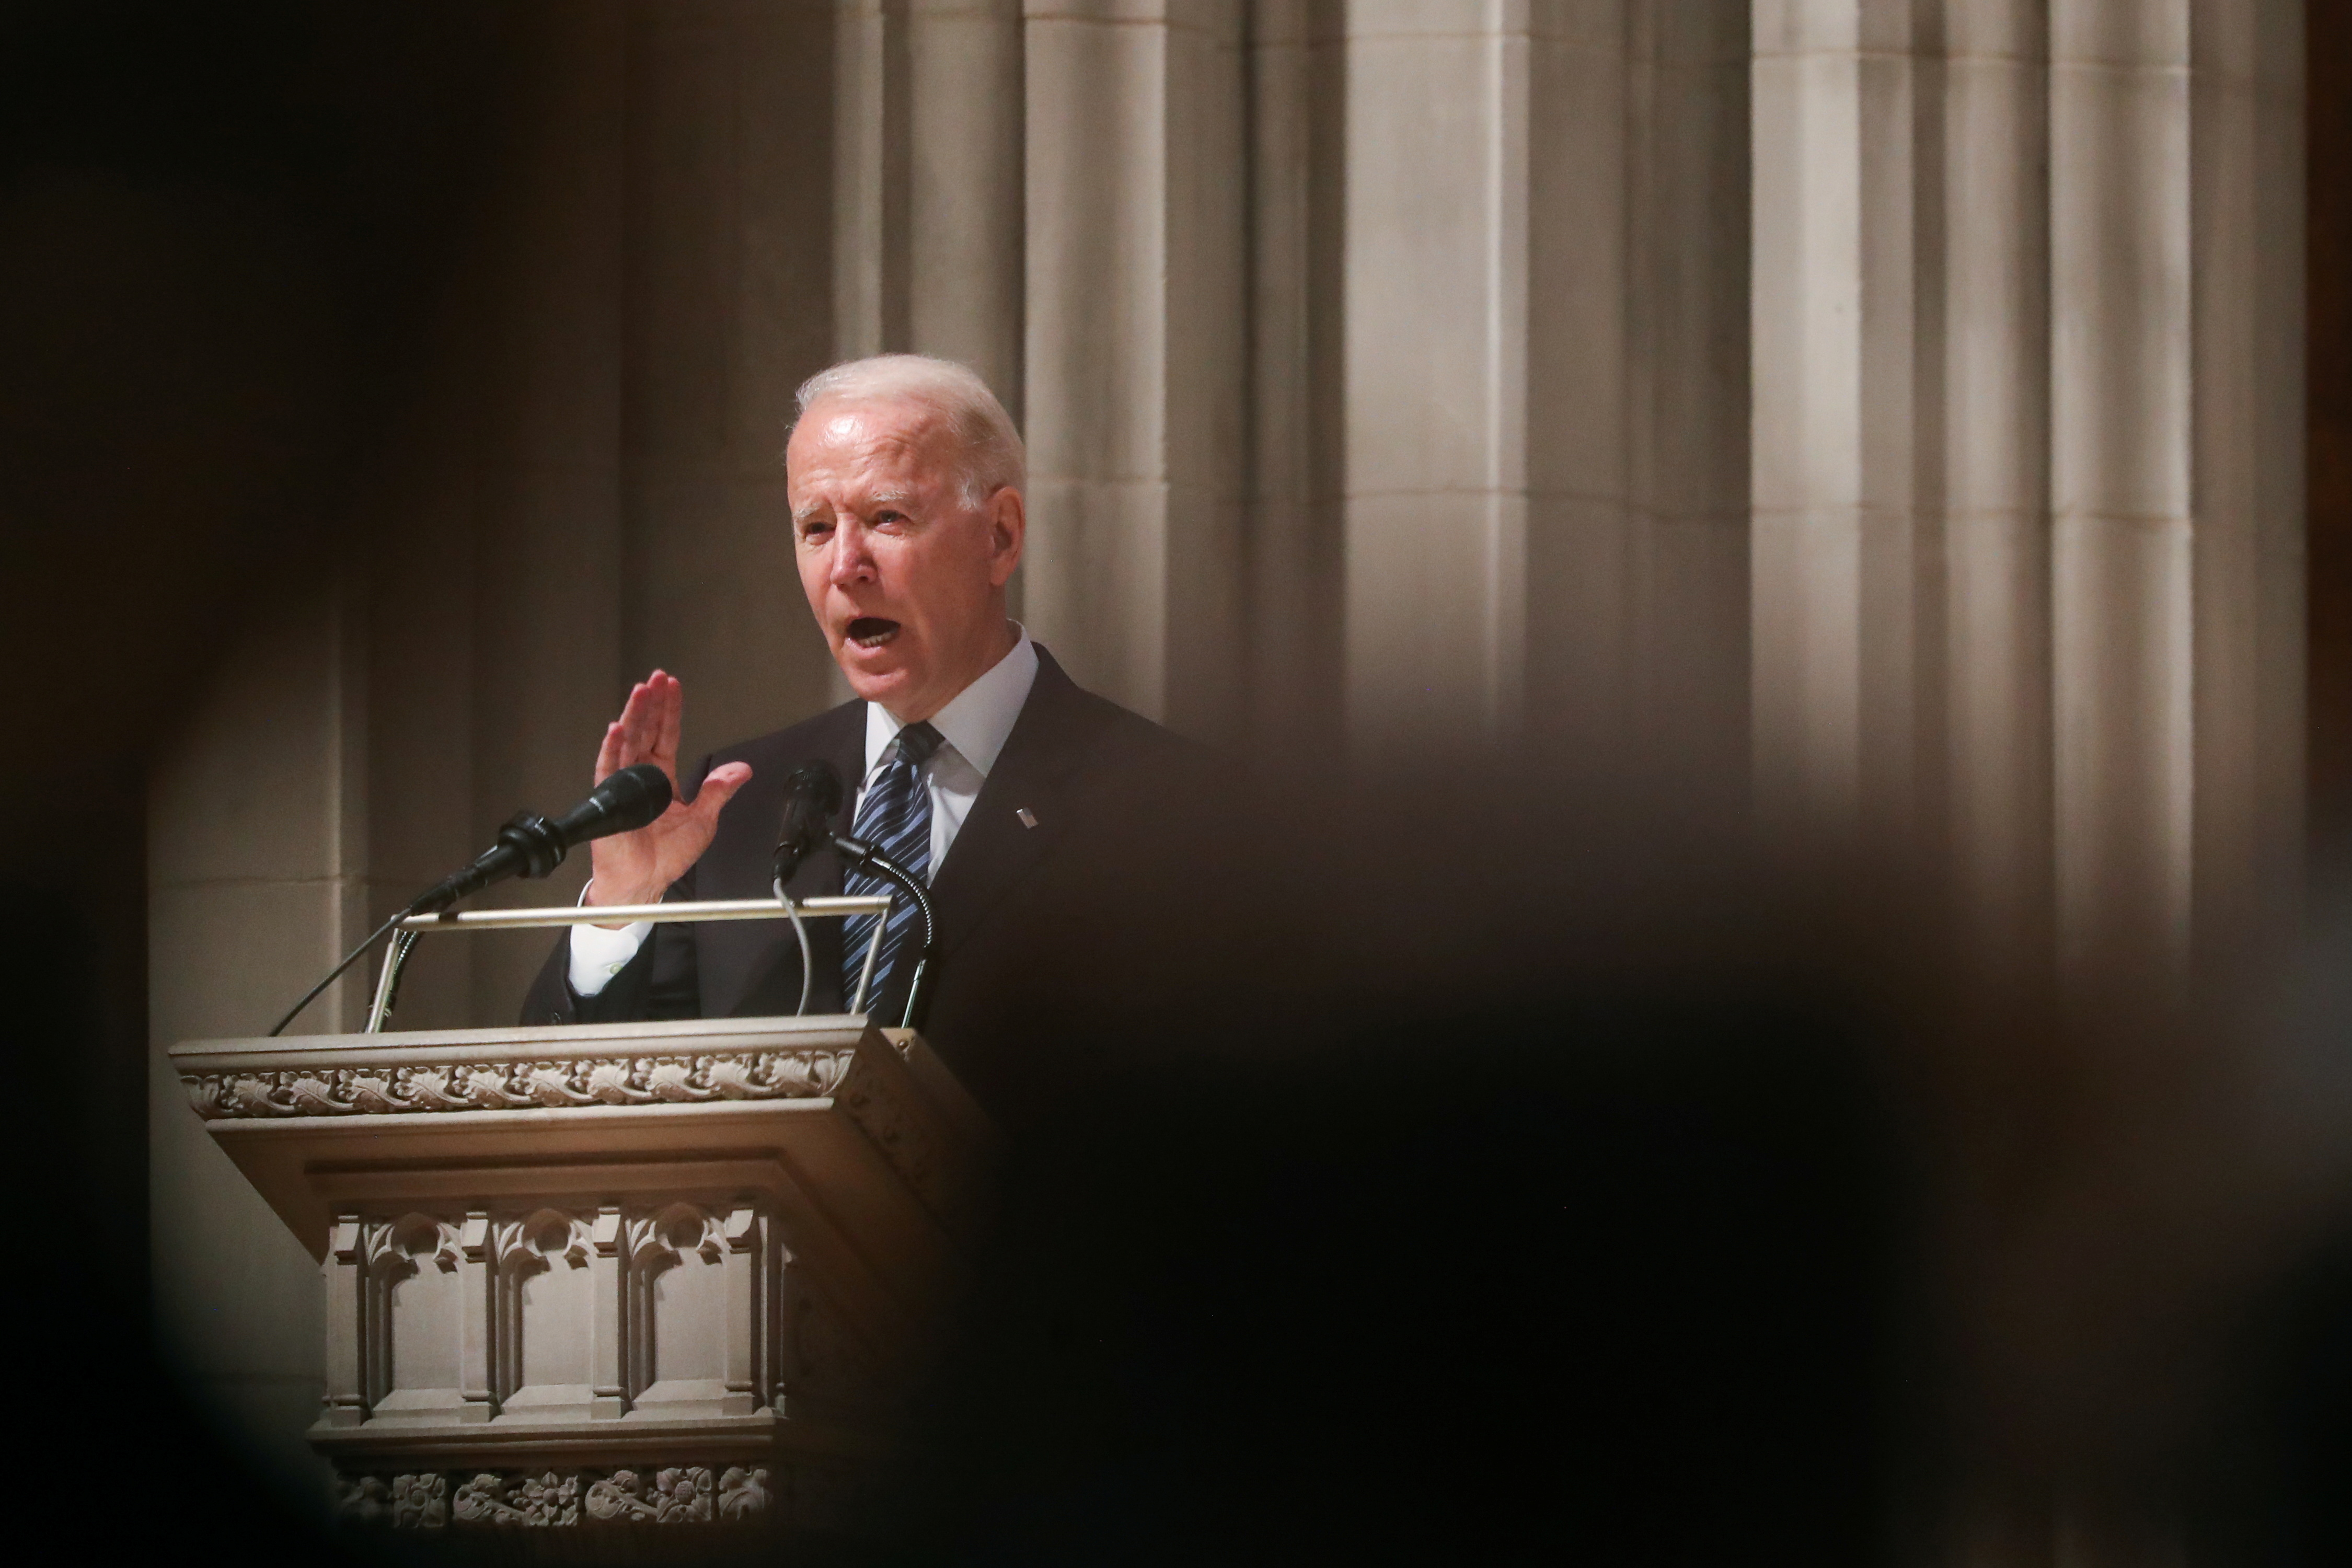 U.S. President Joe Biden speaks during the funeral ceremony of former Senator John Warner at Washington National Cathedral in Washington, DC, U.S. June 23, 2021. Oliver Contreras/Pool via REUTERS